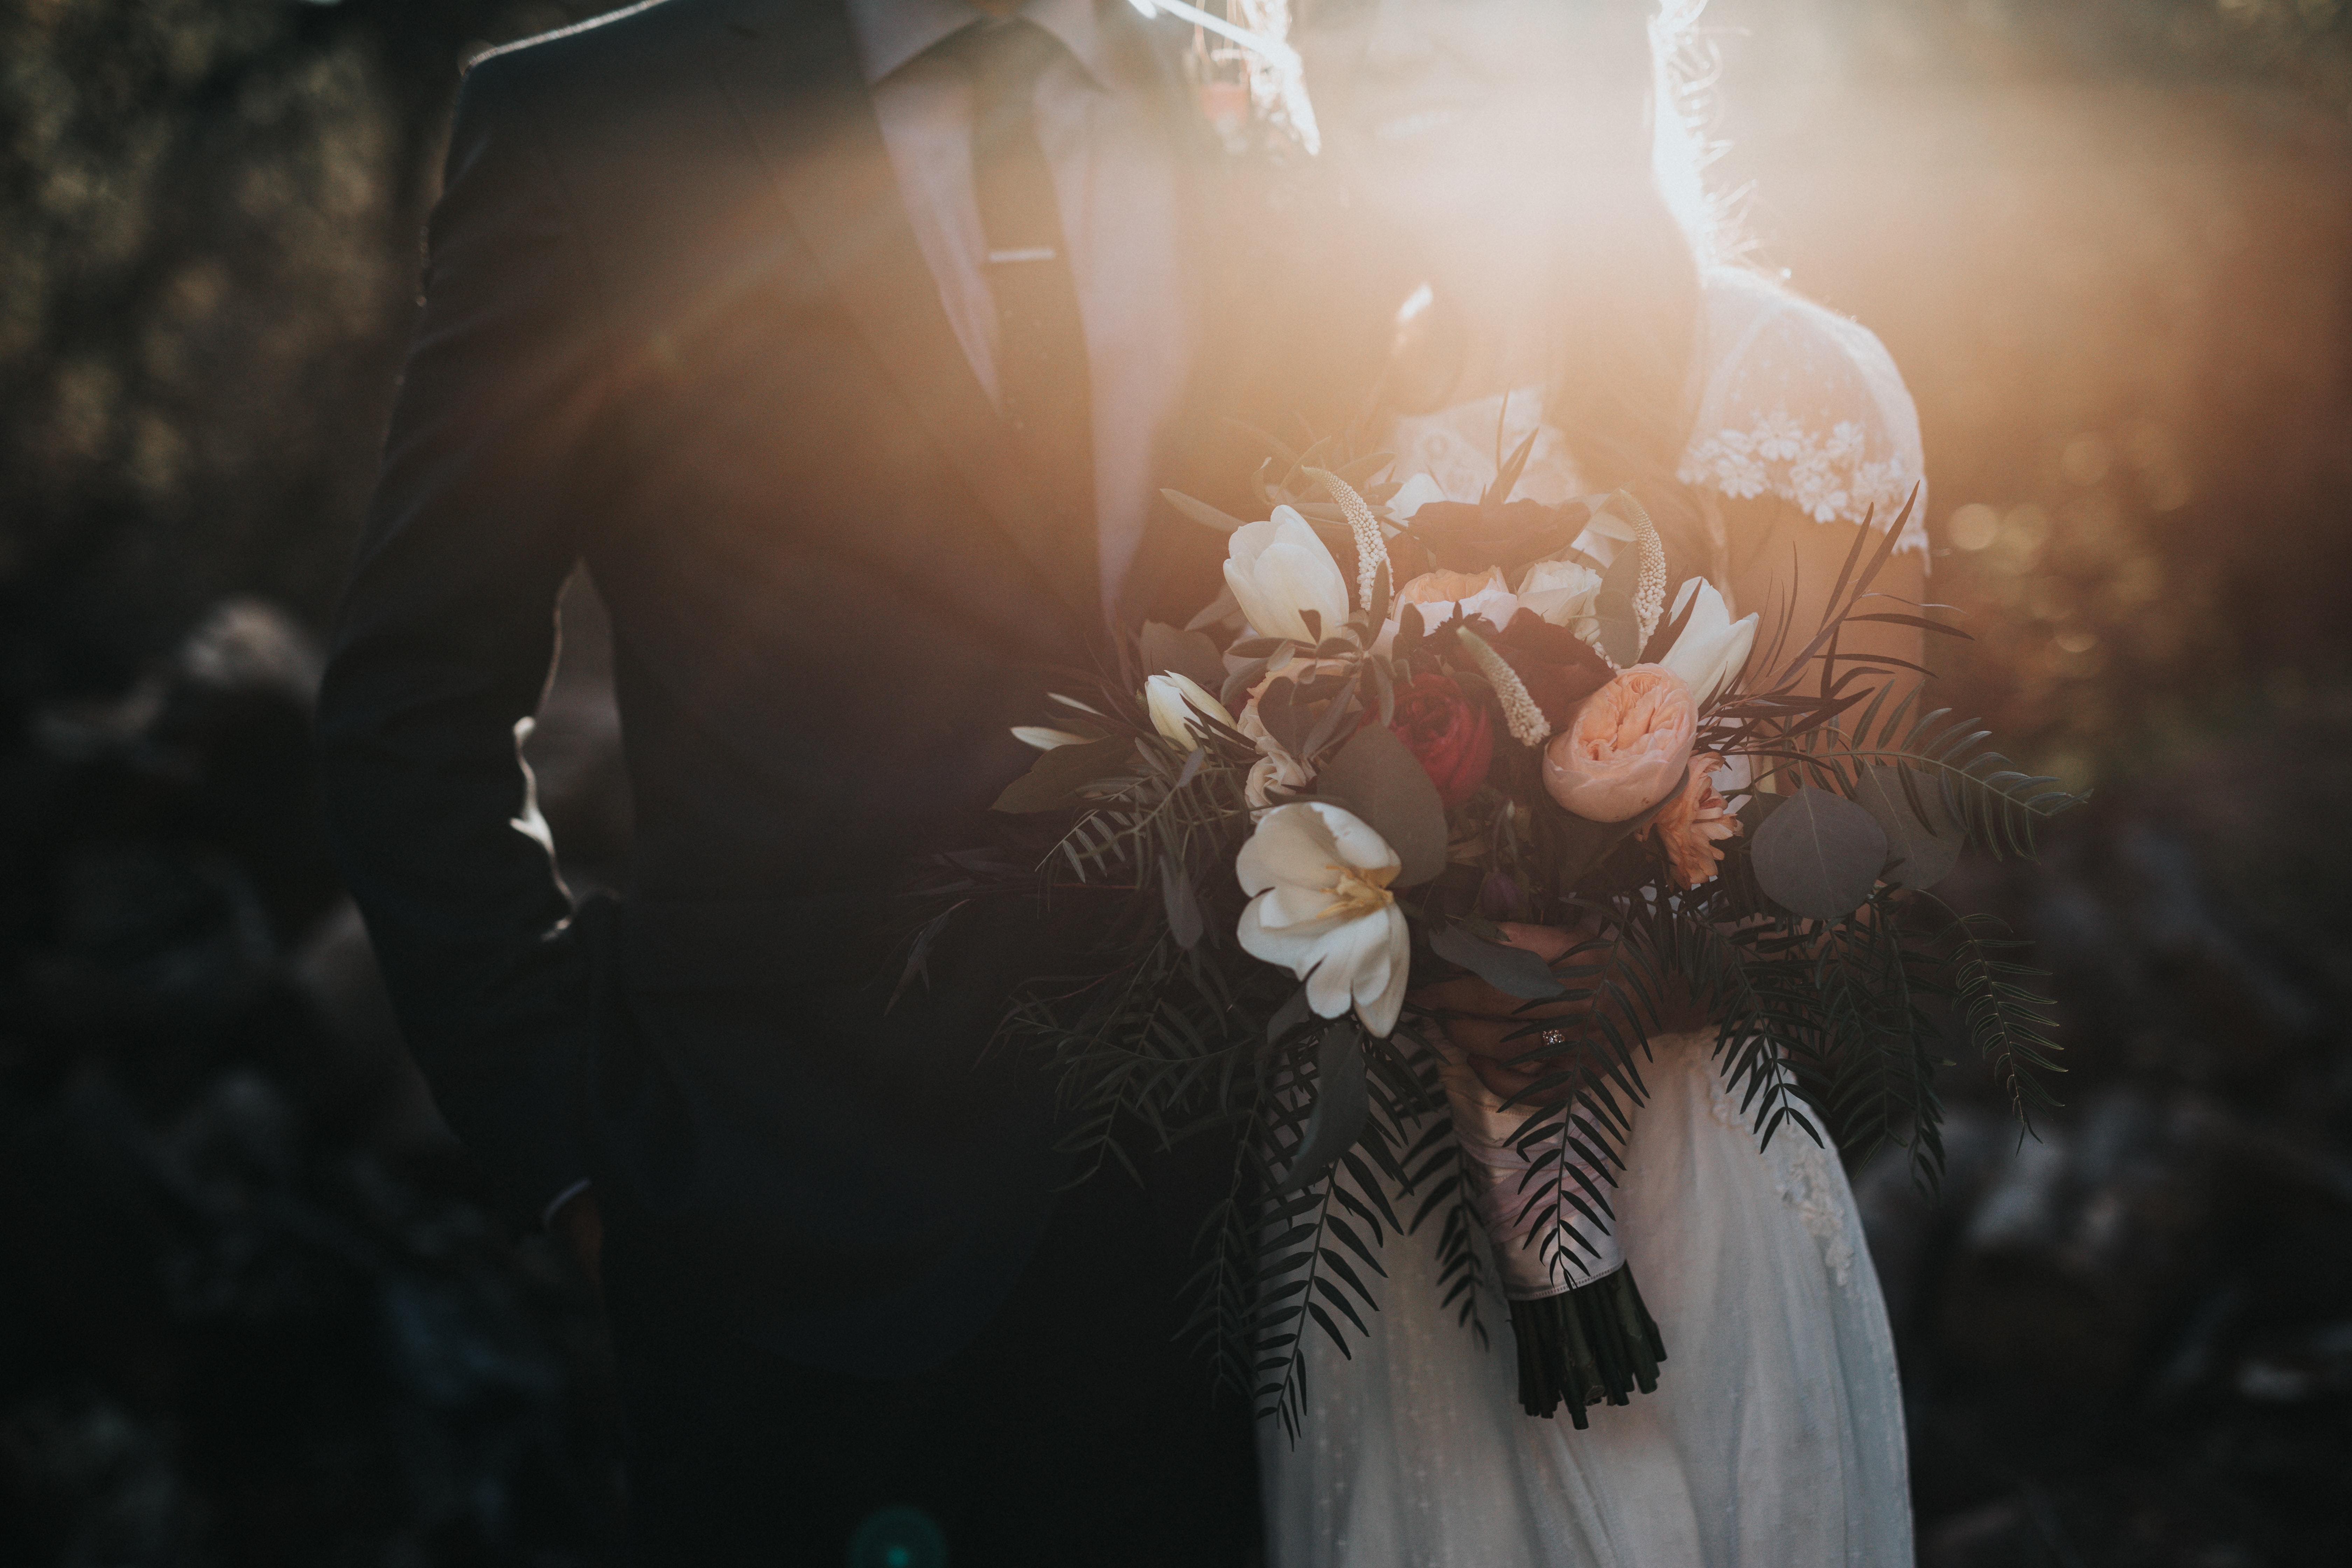 Break out the Botox®, Boca: It's Wedding Season